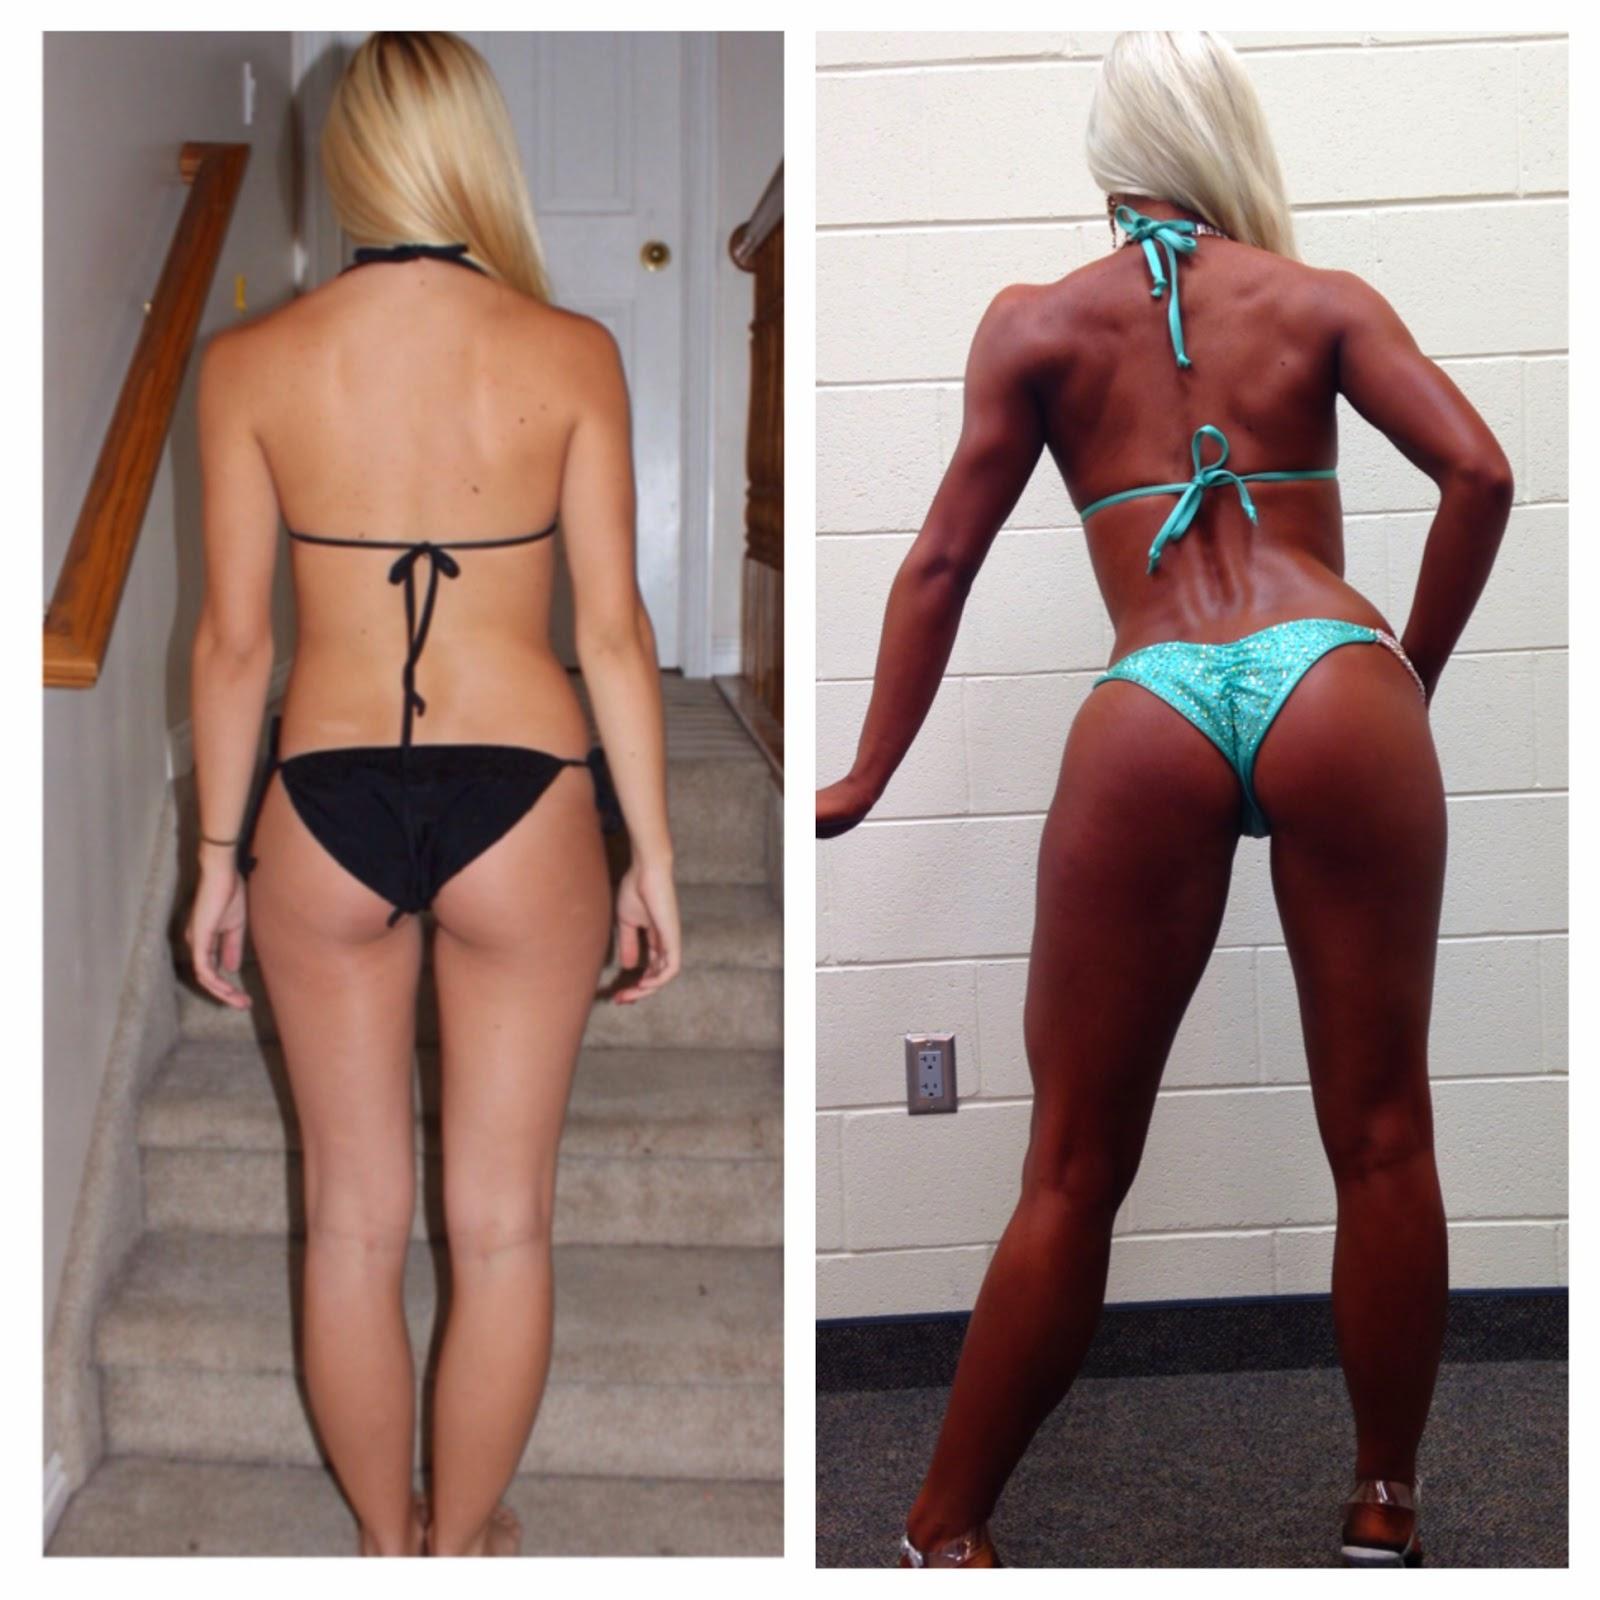 Body Fat Scale Athlete 103